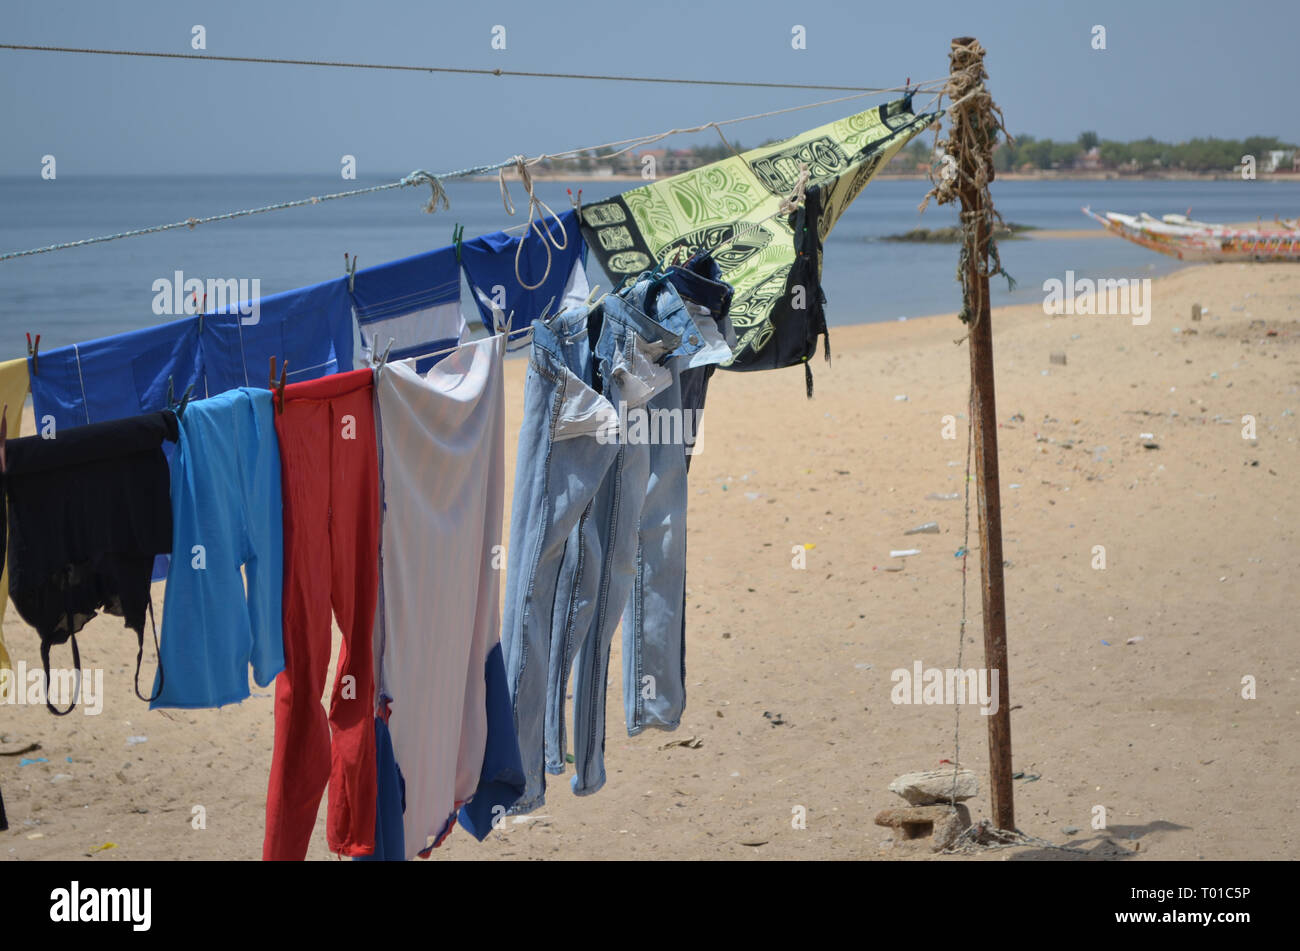 Ngaparou, a small coastal community in the Petite Cote of Senegal - Stock Image